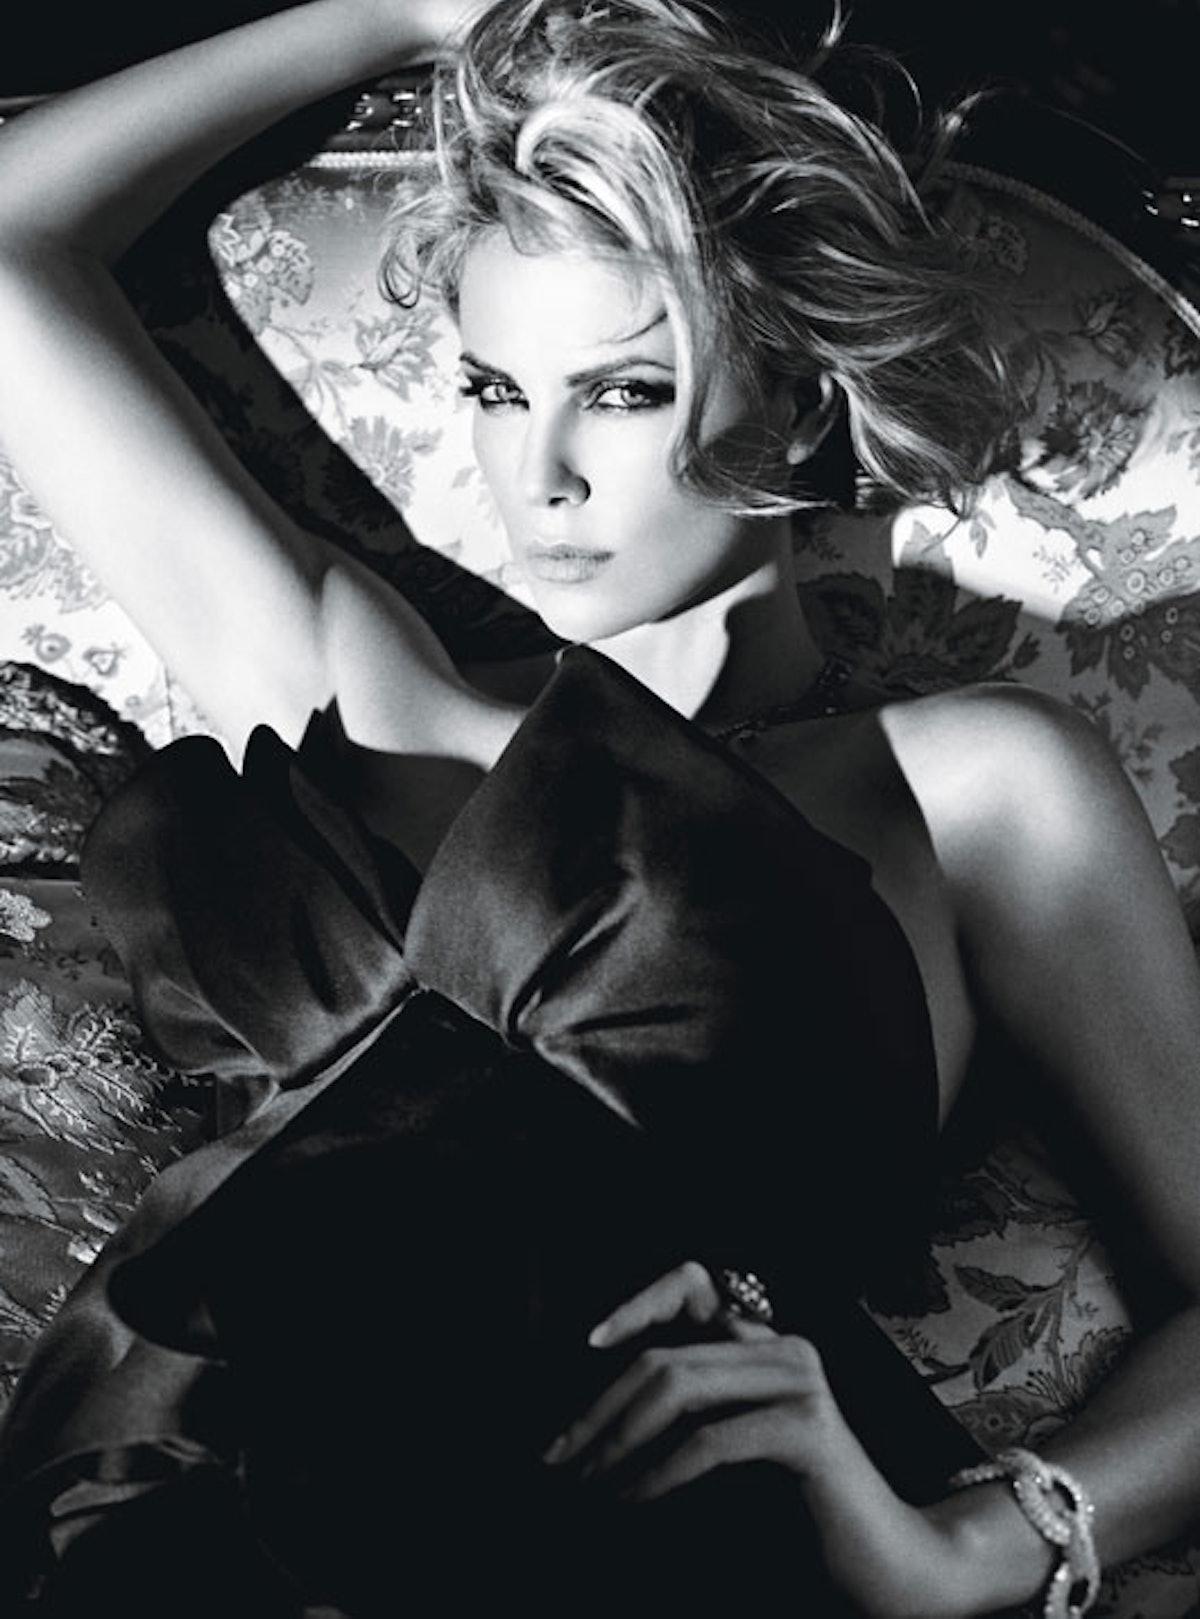 cess-best-performances-actor-portfolio-2012-21-l.jpg